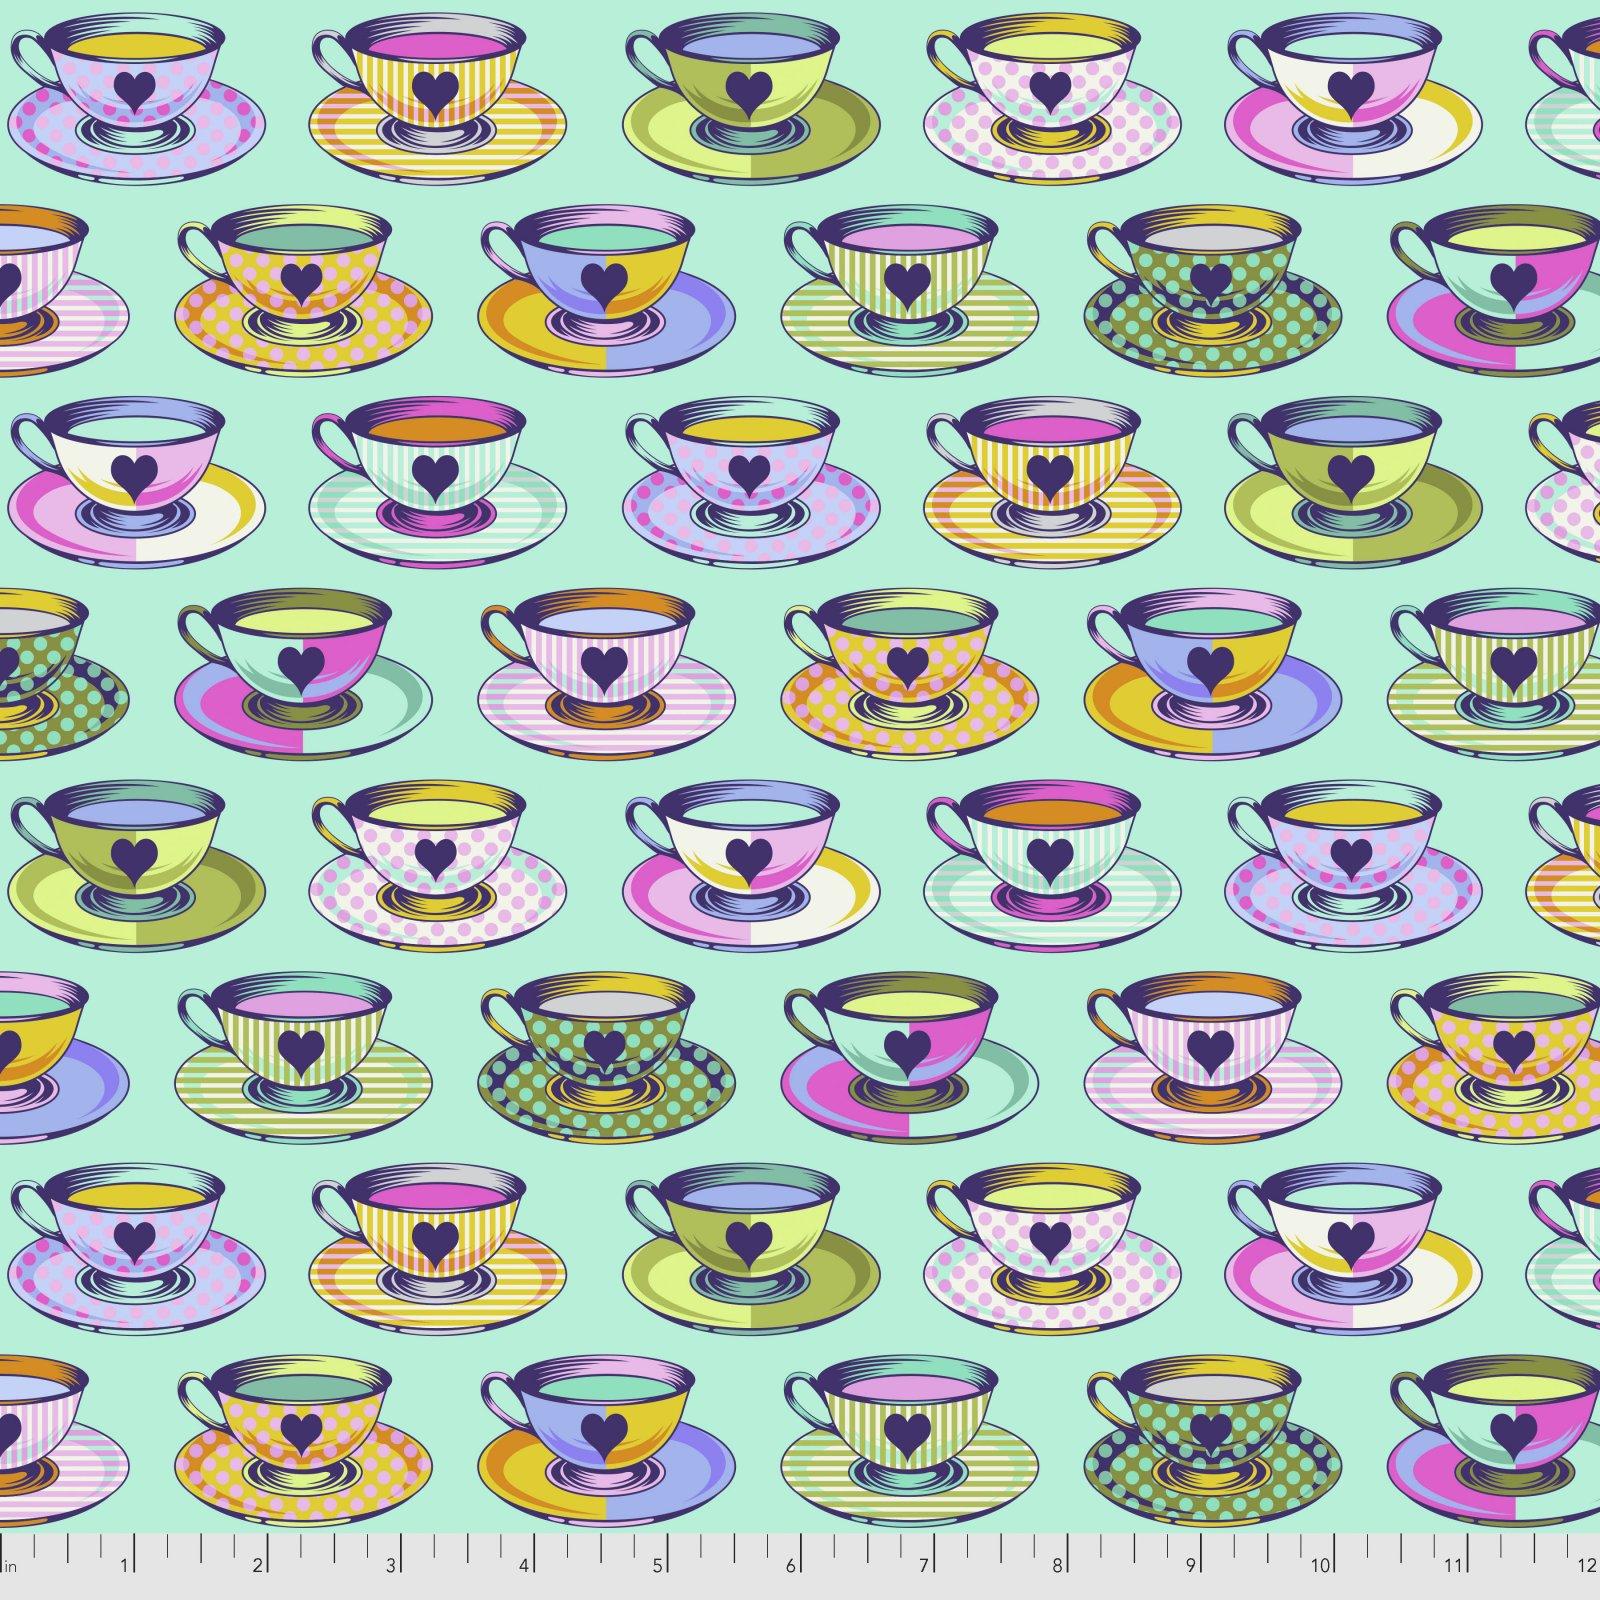 Curiouser and Curiouser Tea Time Daydream